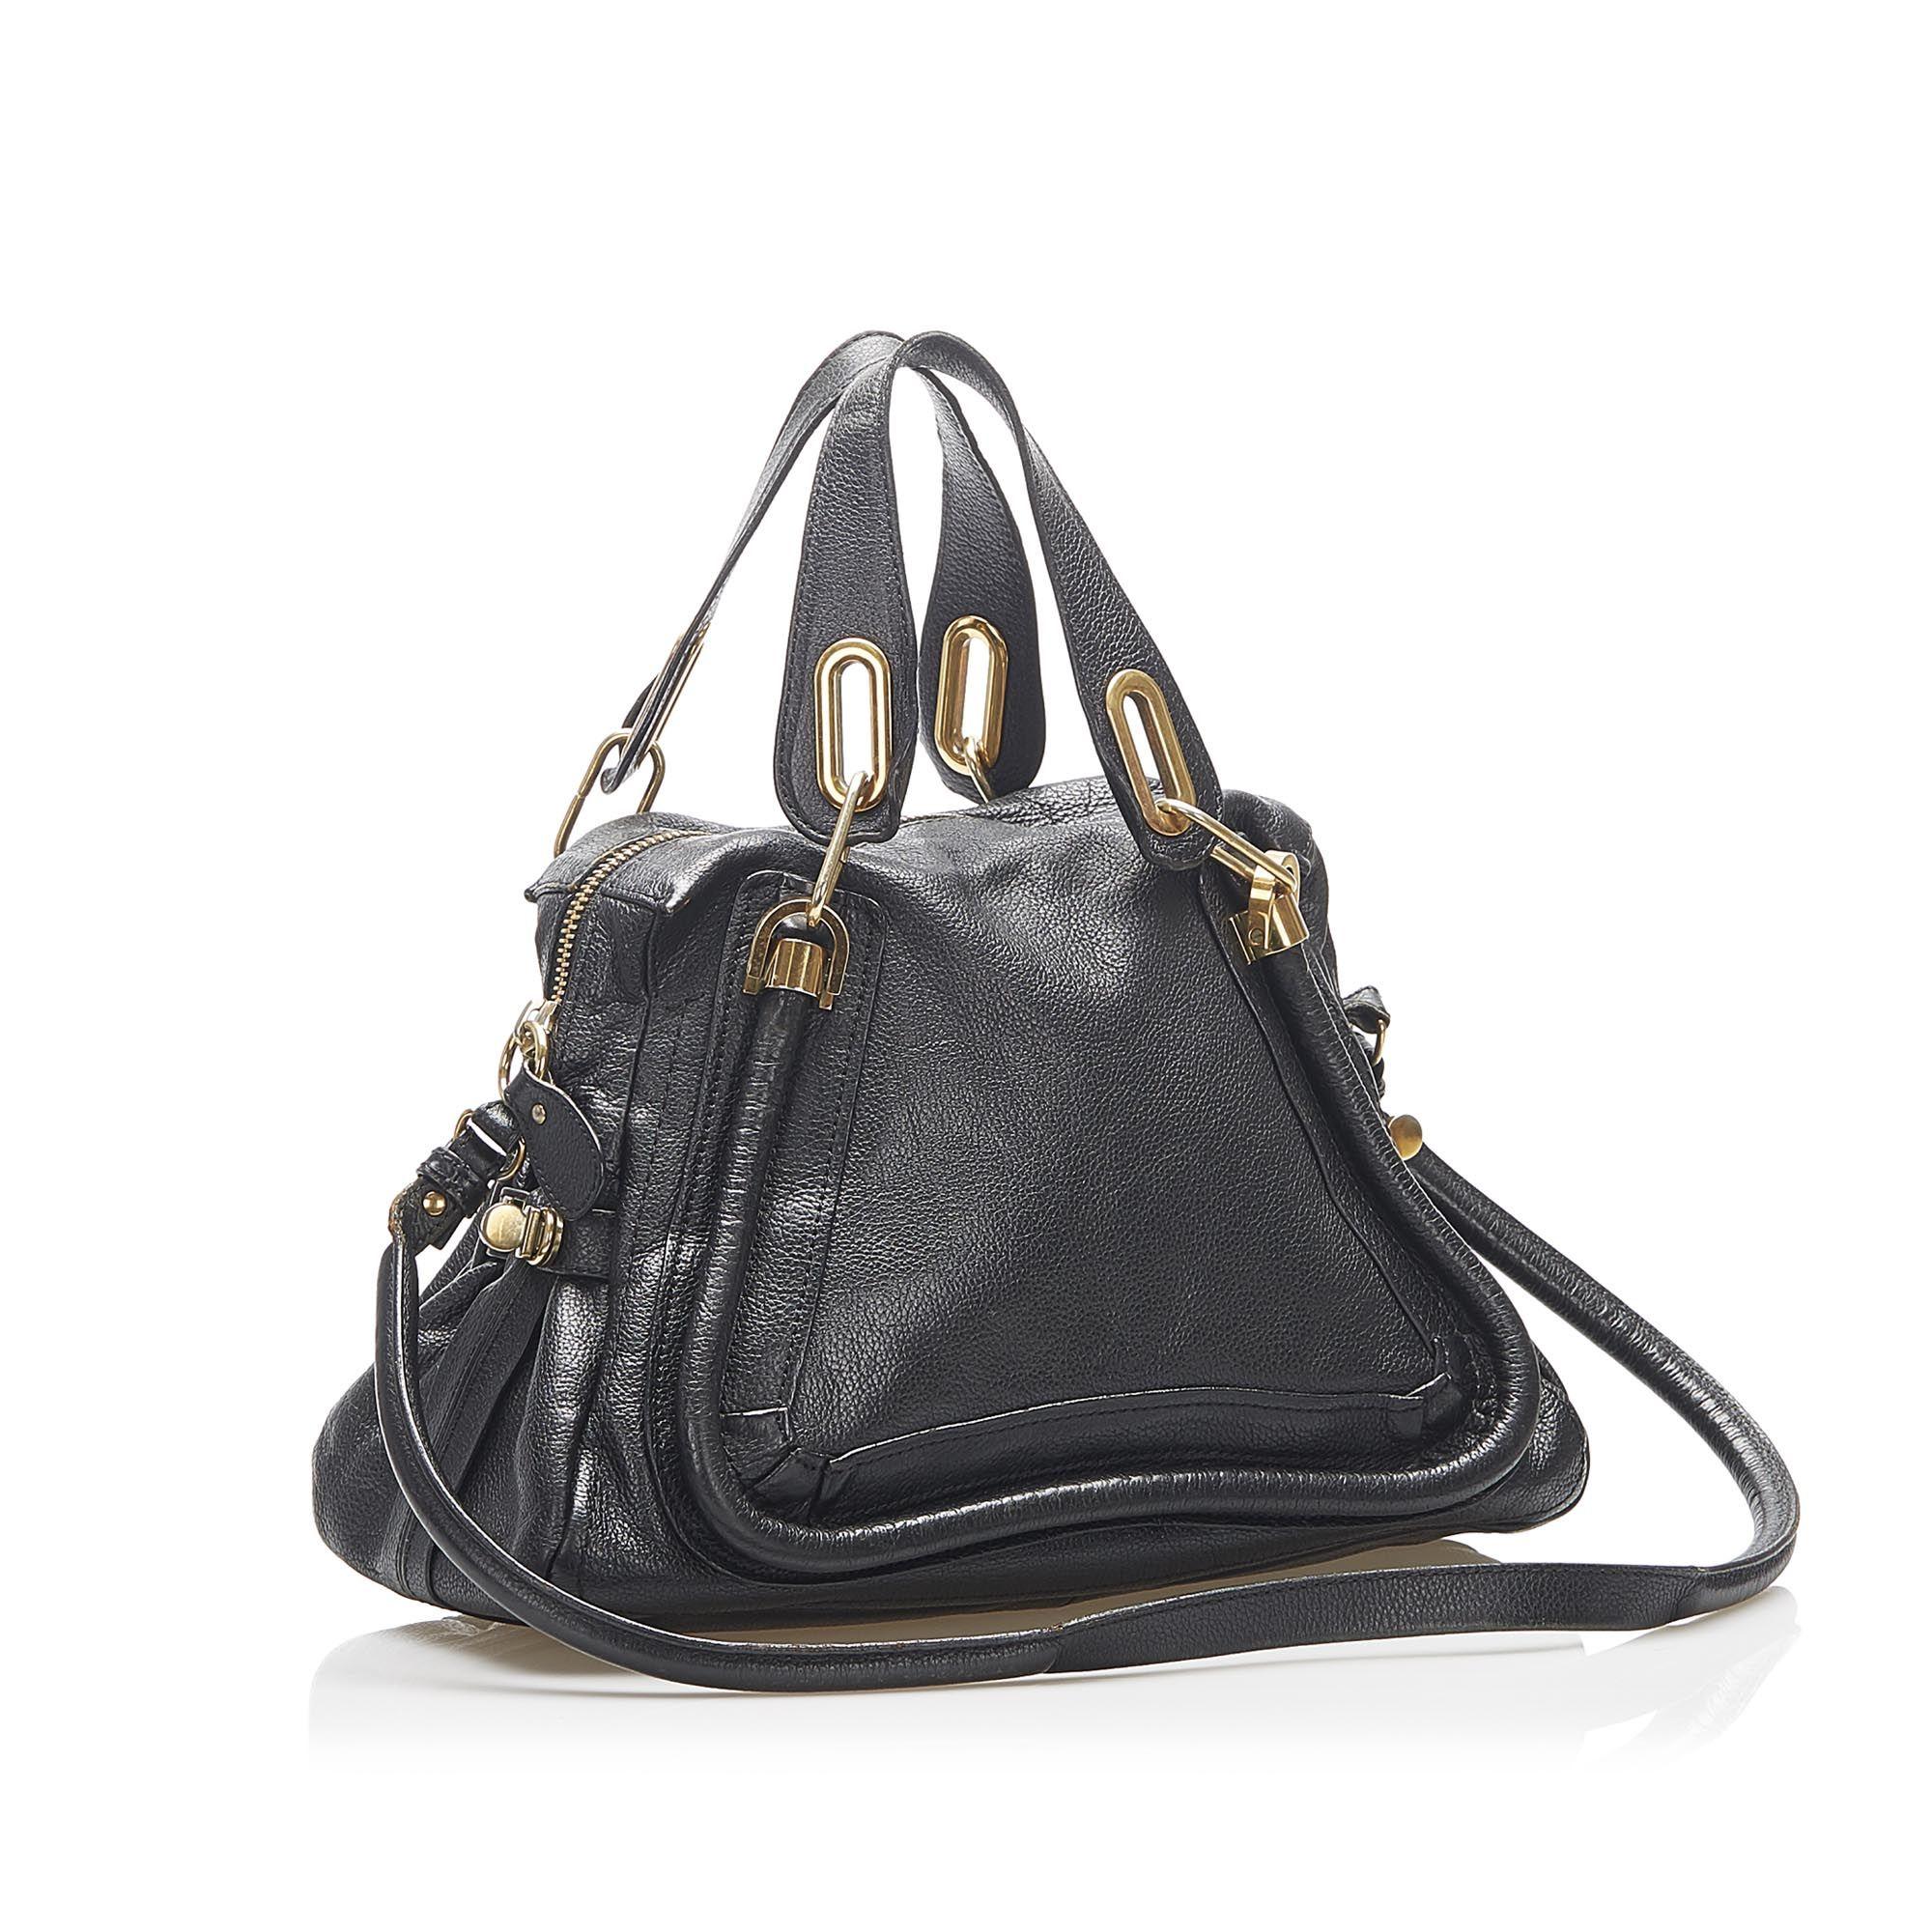 Vintage Chloe Paraty Leather Satchel Black